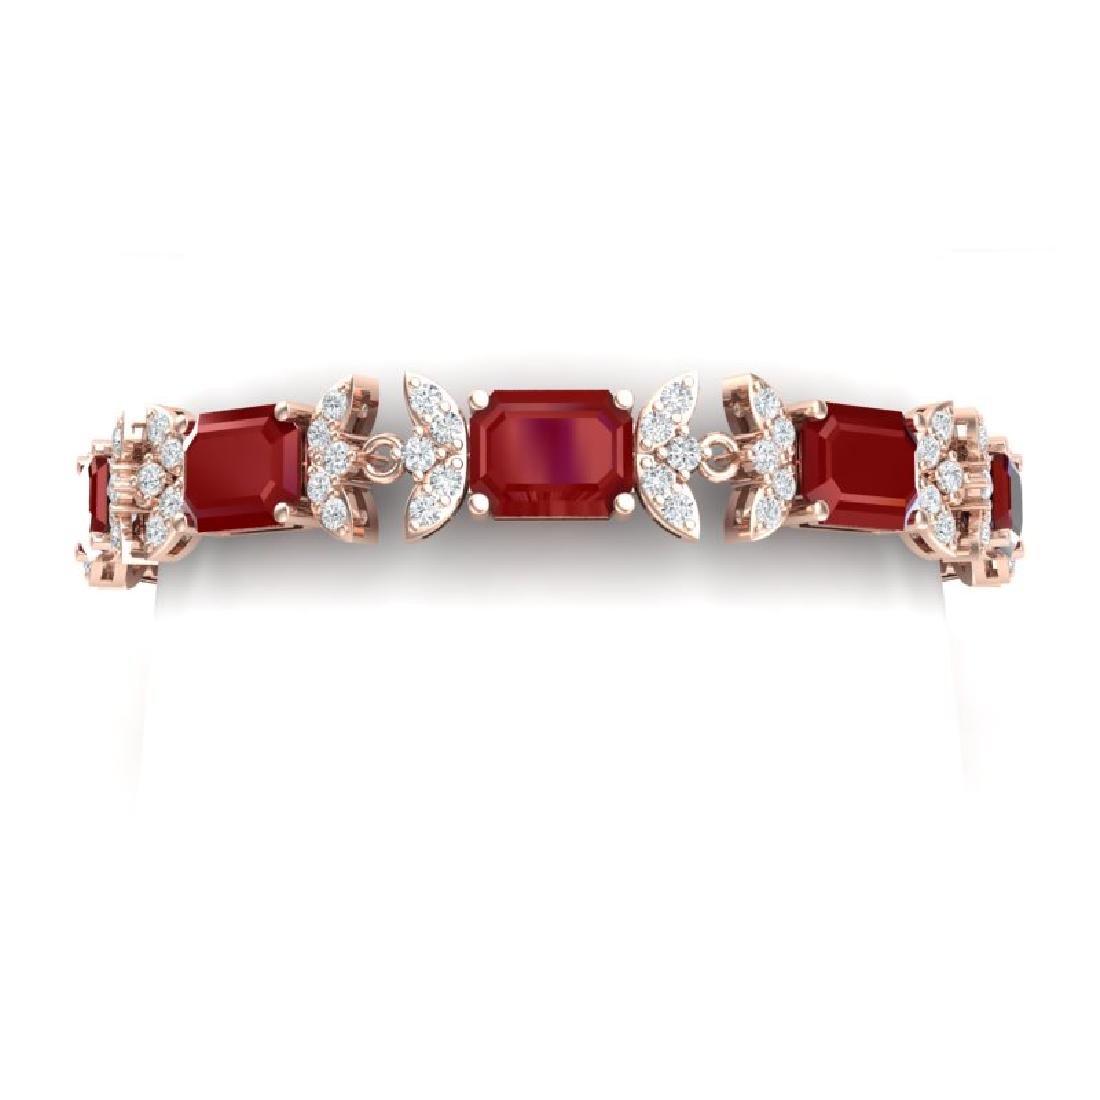 38.13 CTW Royalty Ruby & VS Diamond Bracelet 18K Rose